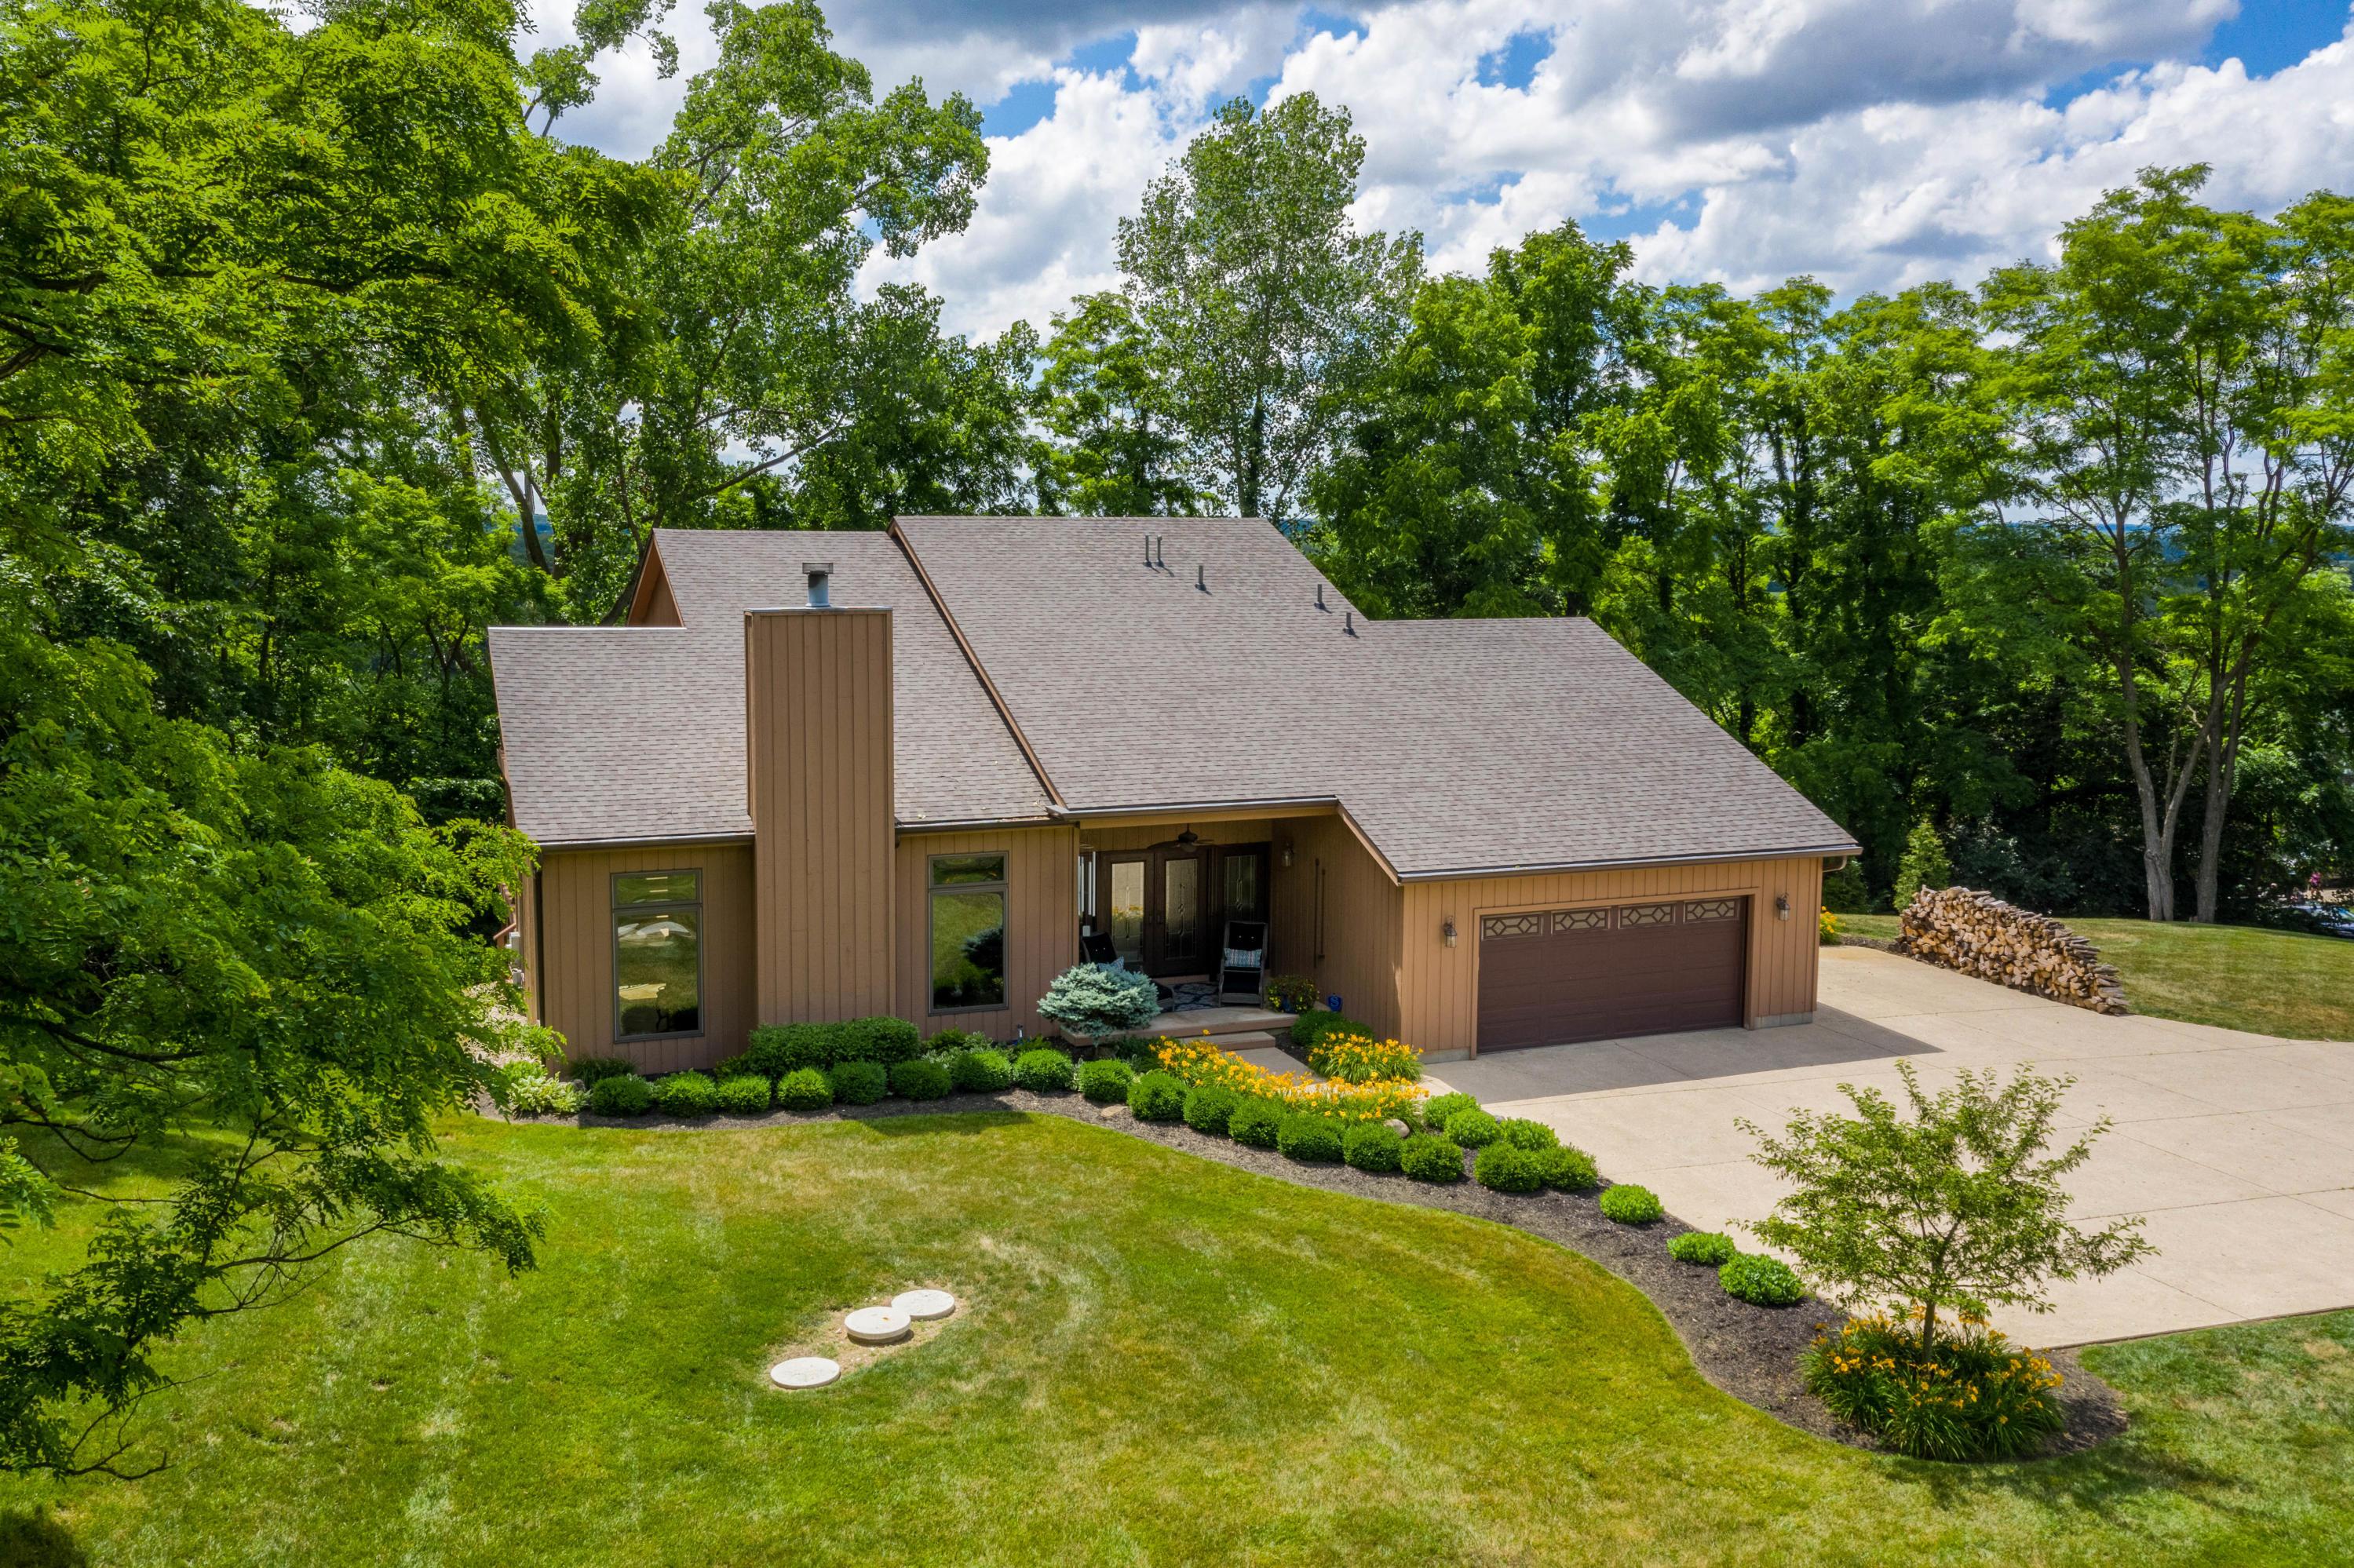 77 Buckhorn Court Property Photo - Urbana, OH real estate listing